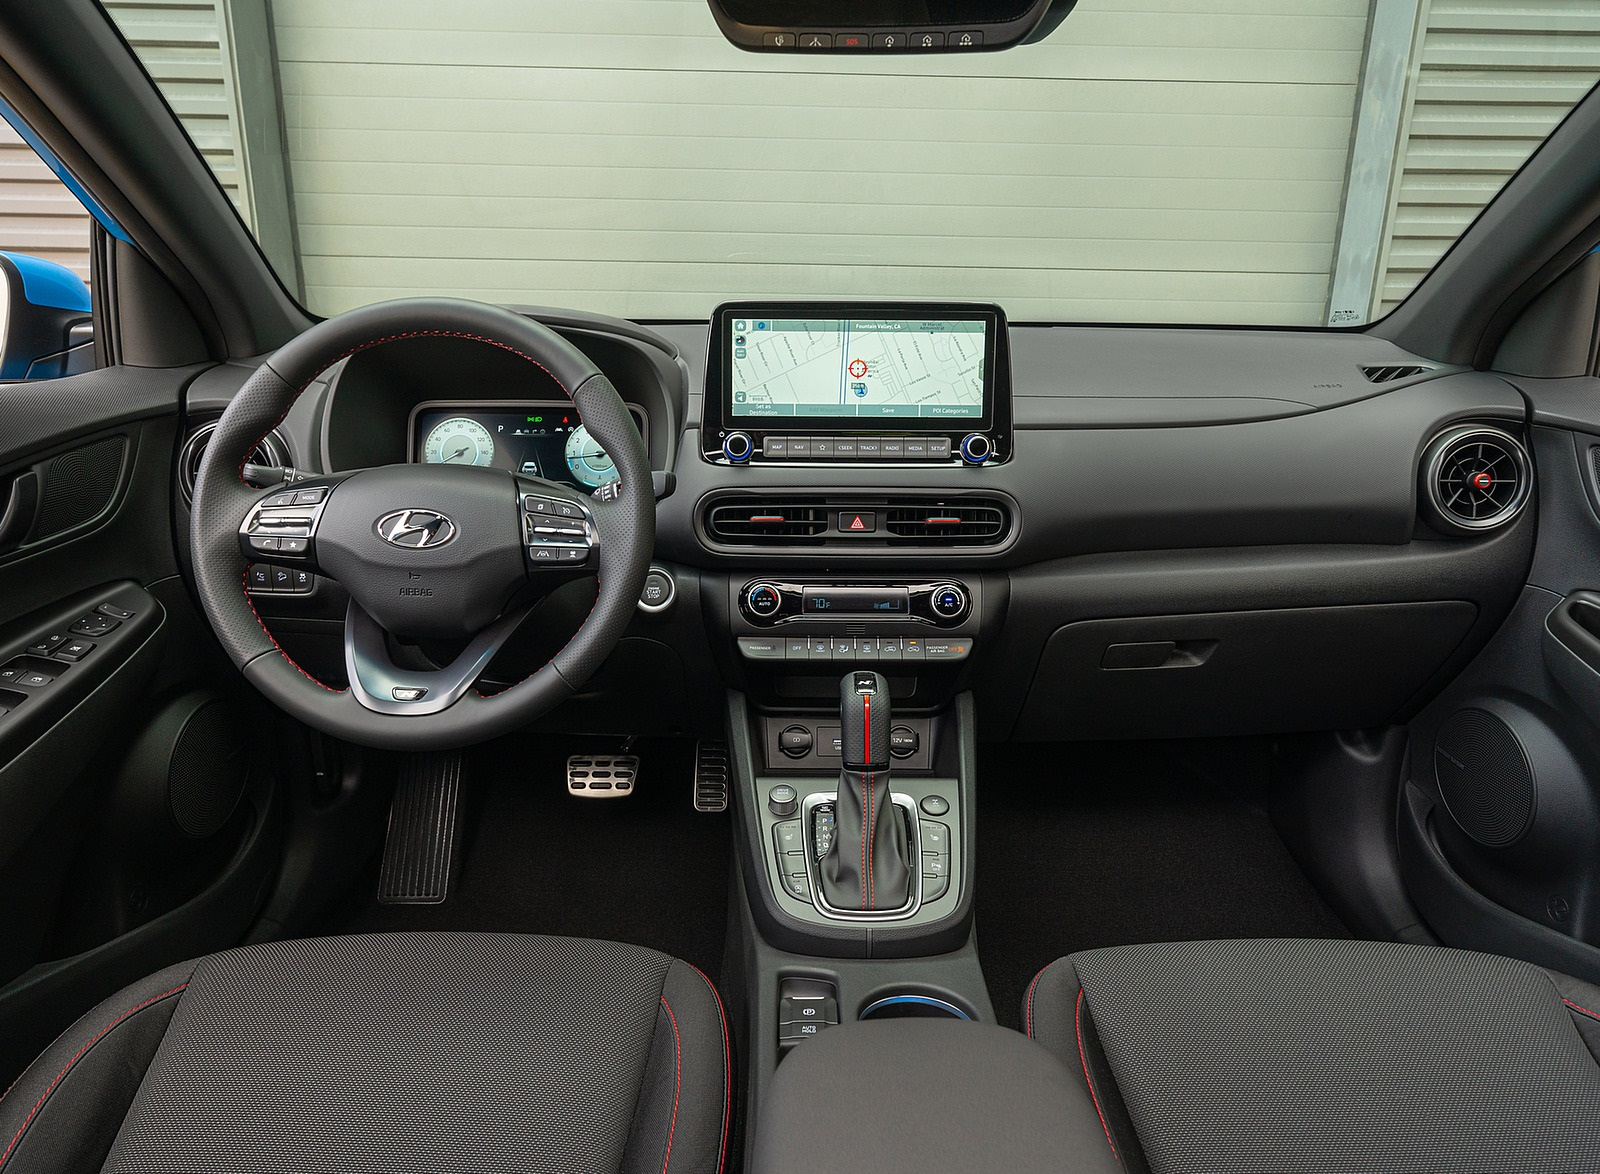 2022 Hyundai Kona N Line Interior Cockpit Wallpapers (10)